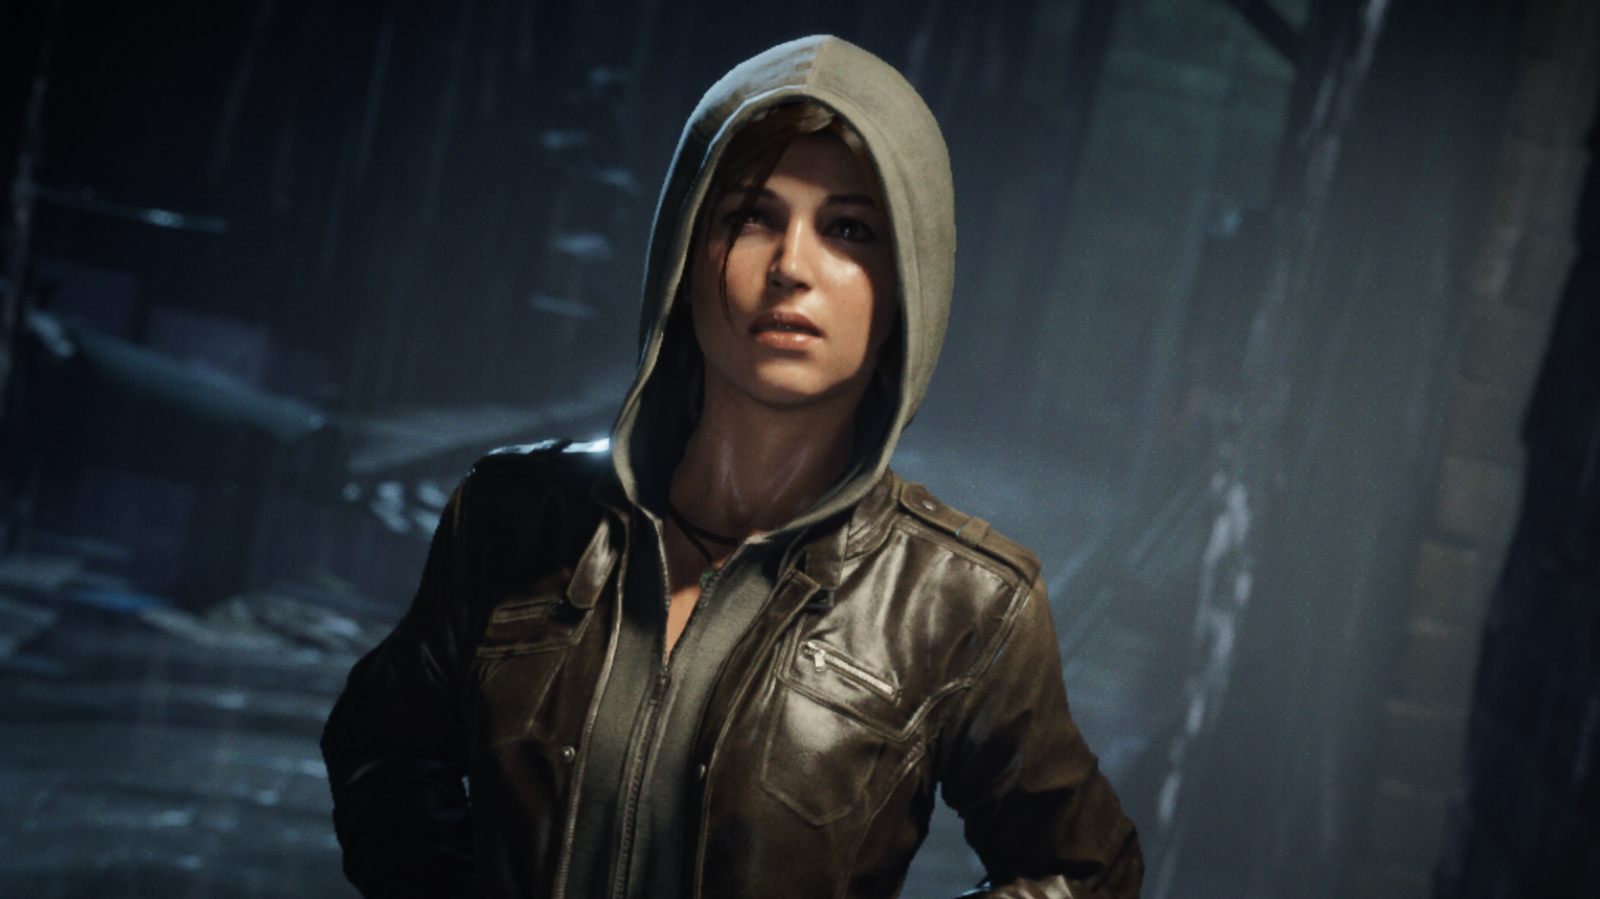 Lara dons a hoodie during a rainy, London night.